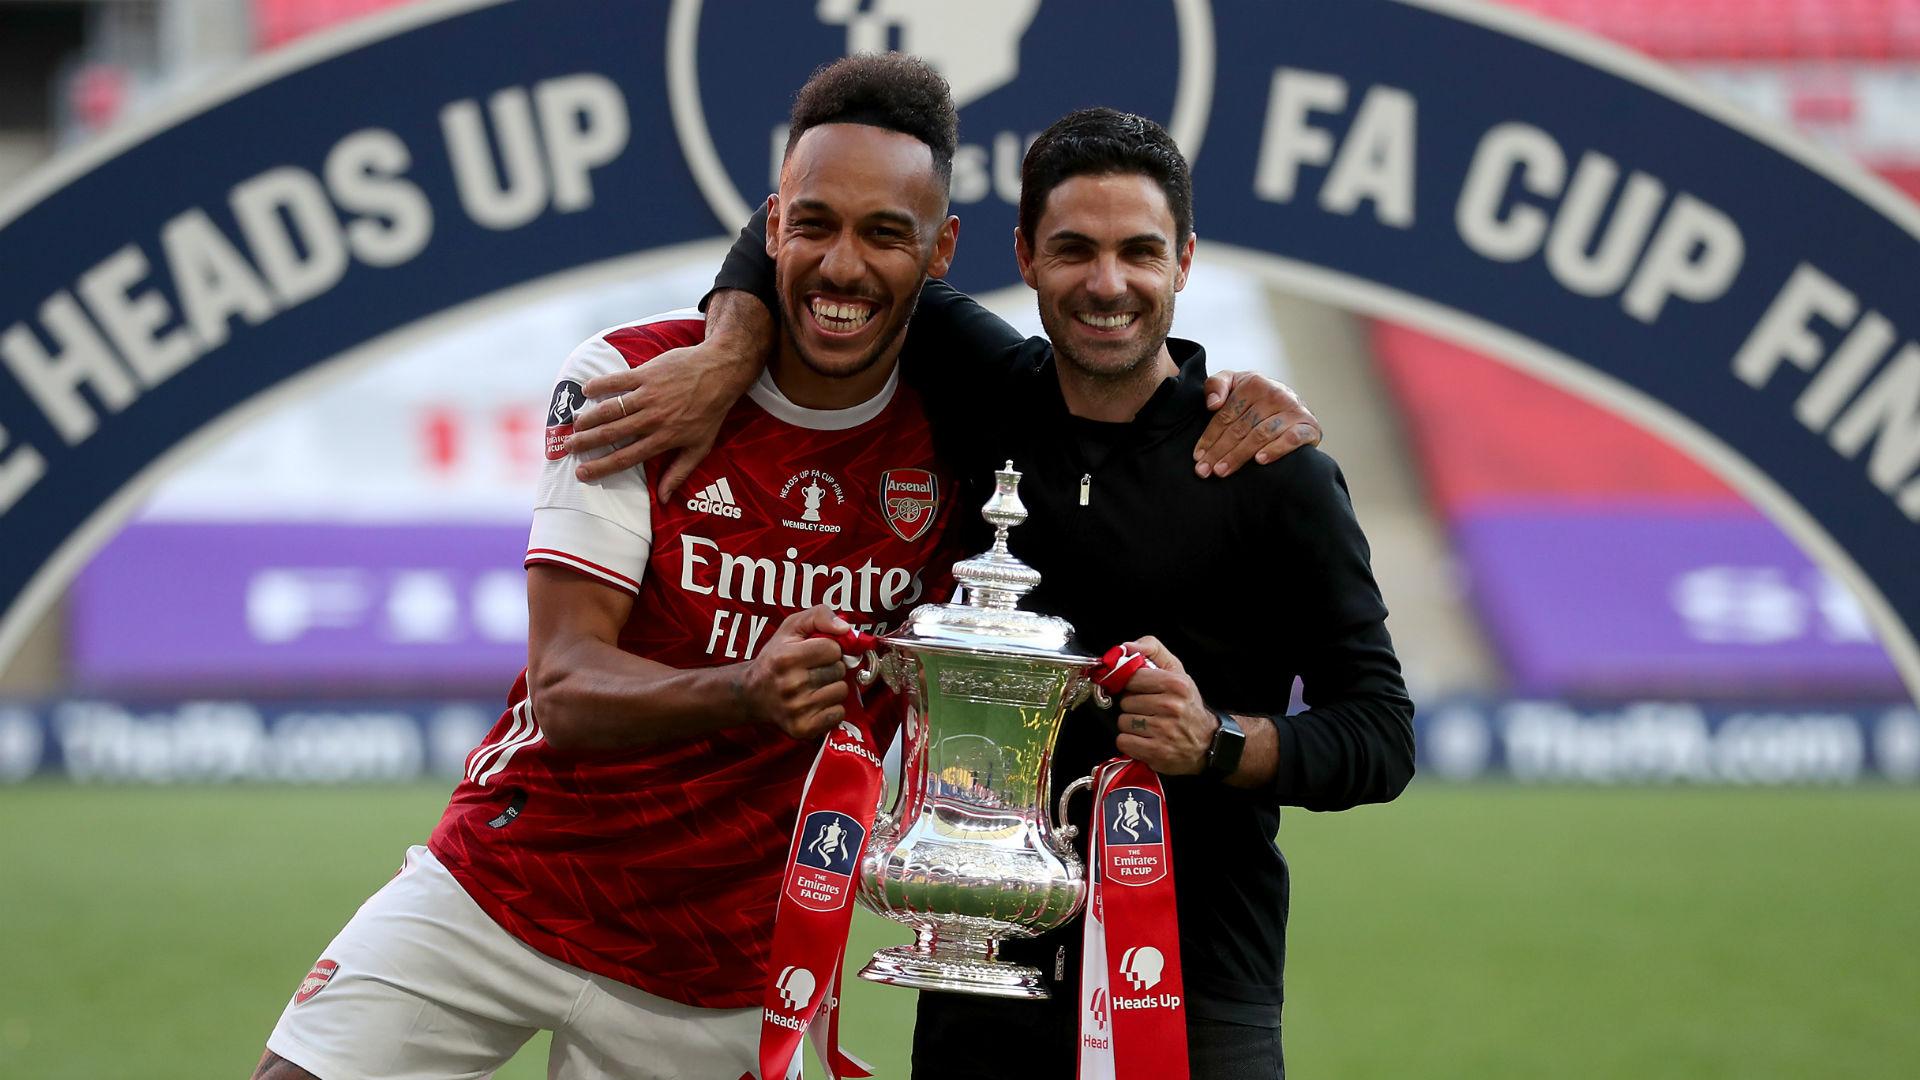 Arteta was worried Aubameyang might leave Arsenal